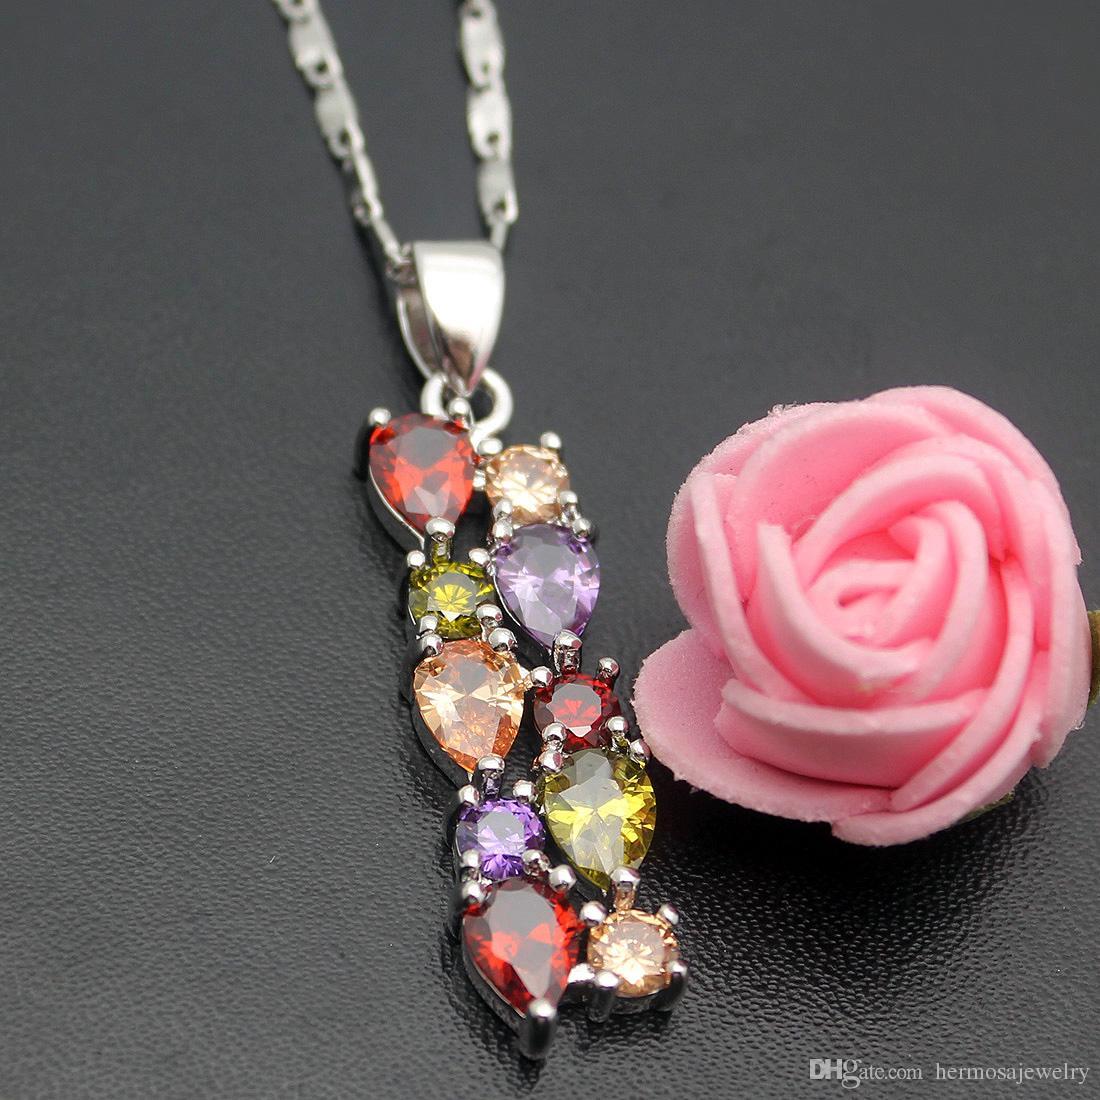 Frauen Schmuck Sterling Silber Anhänger Halskette Edelstein Morganite Granat Amethyst Peridot Dazzling Prom Modeschmuck Kette 18